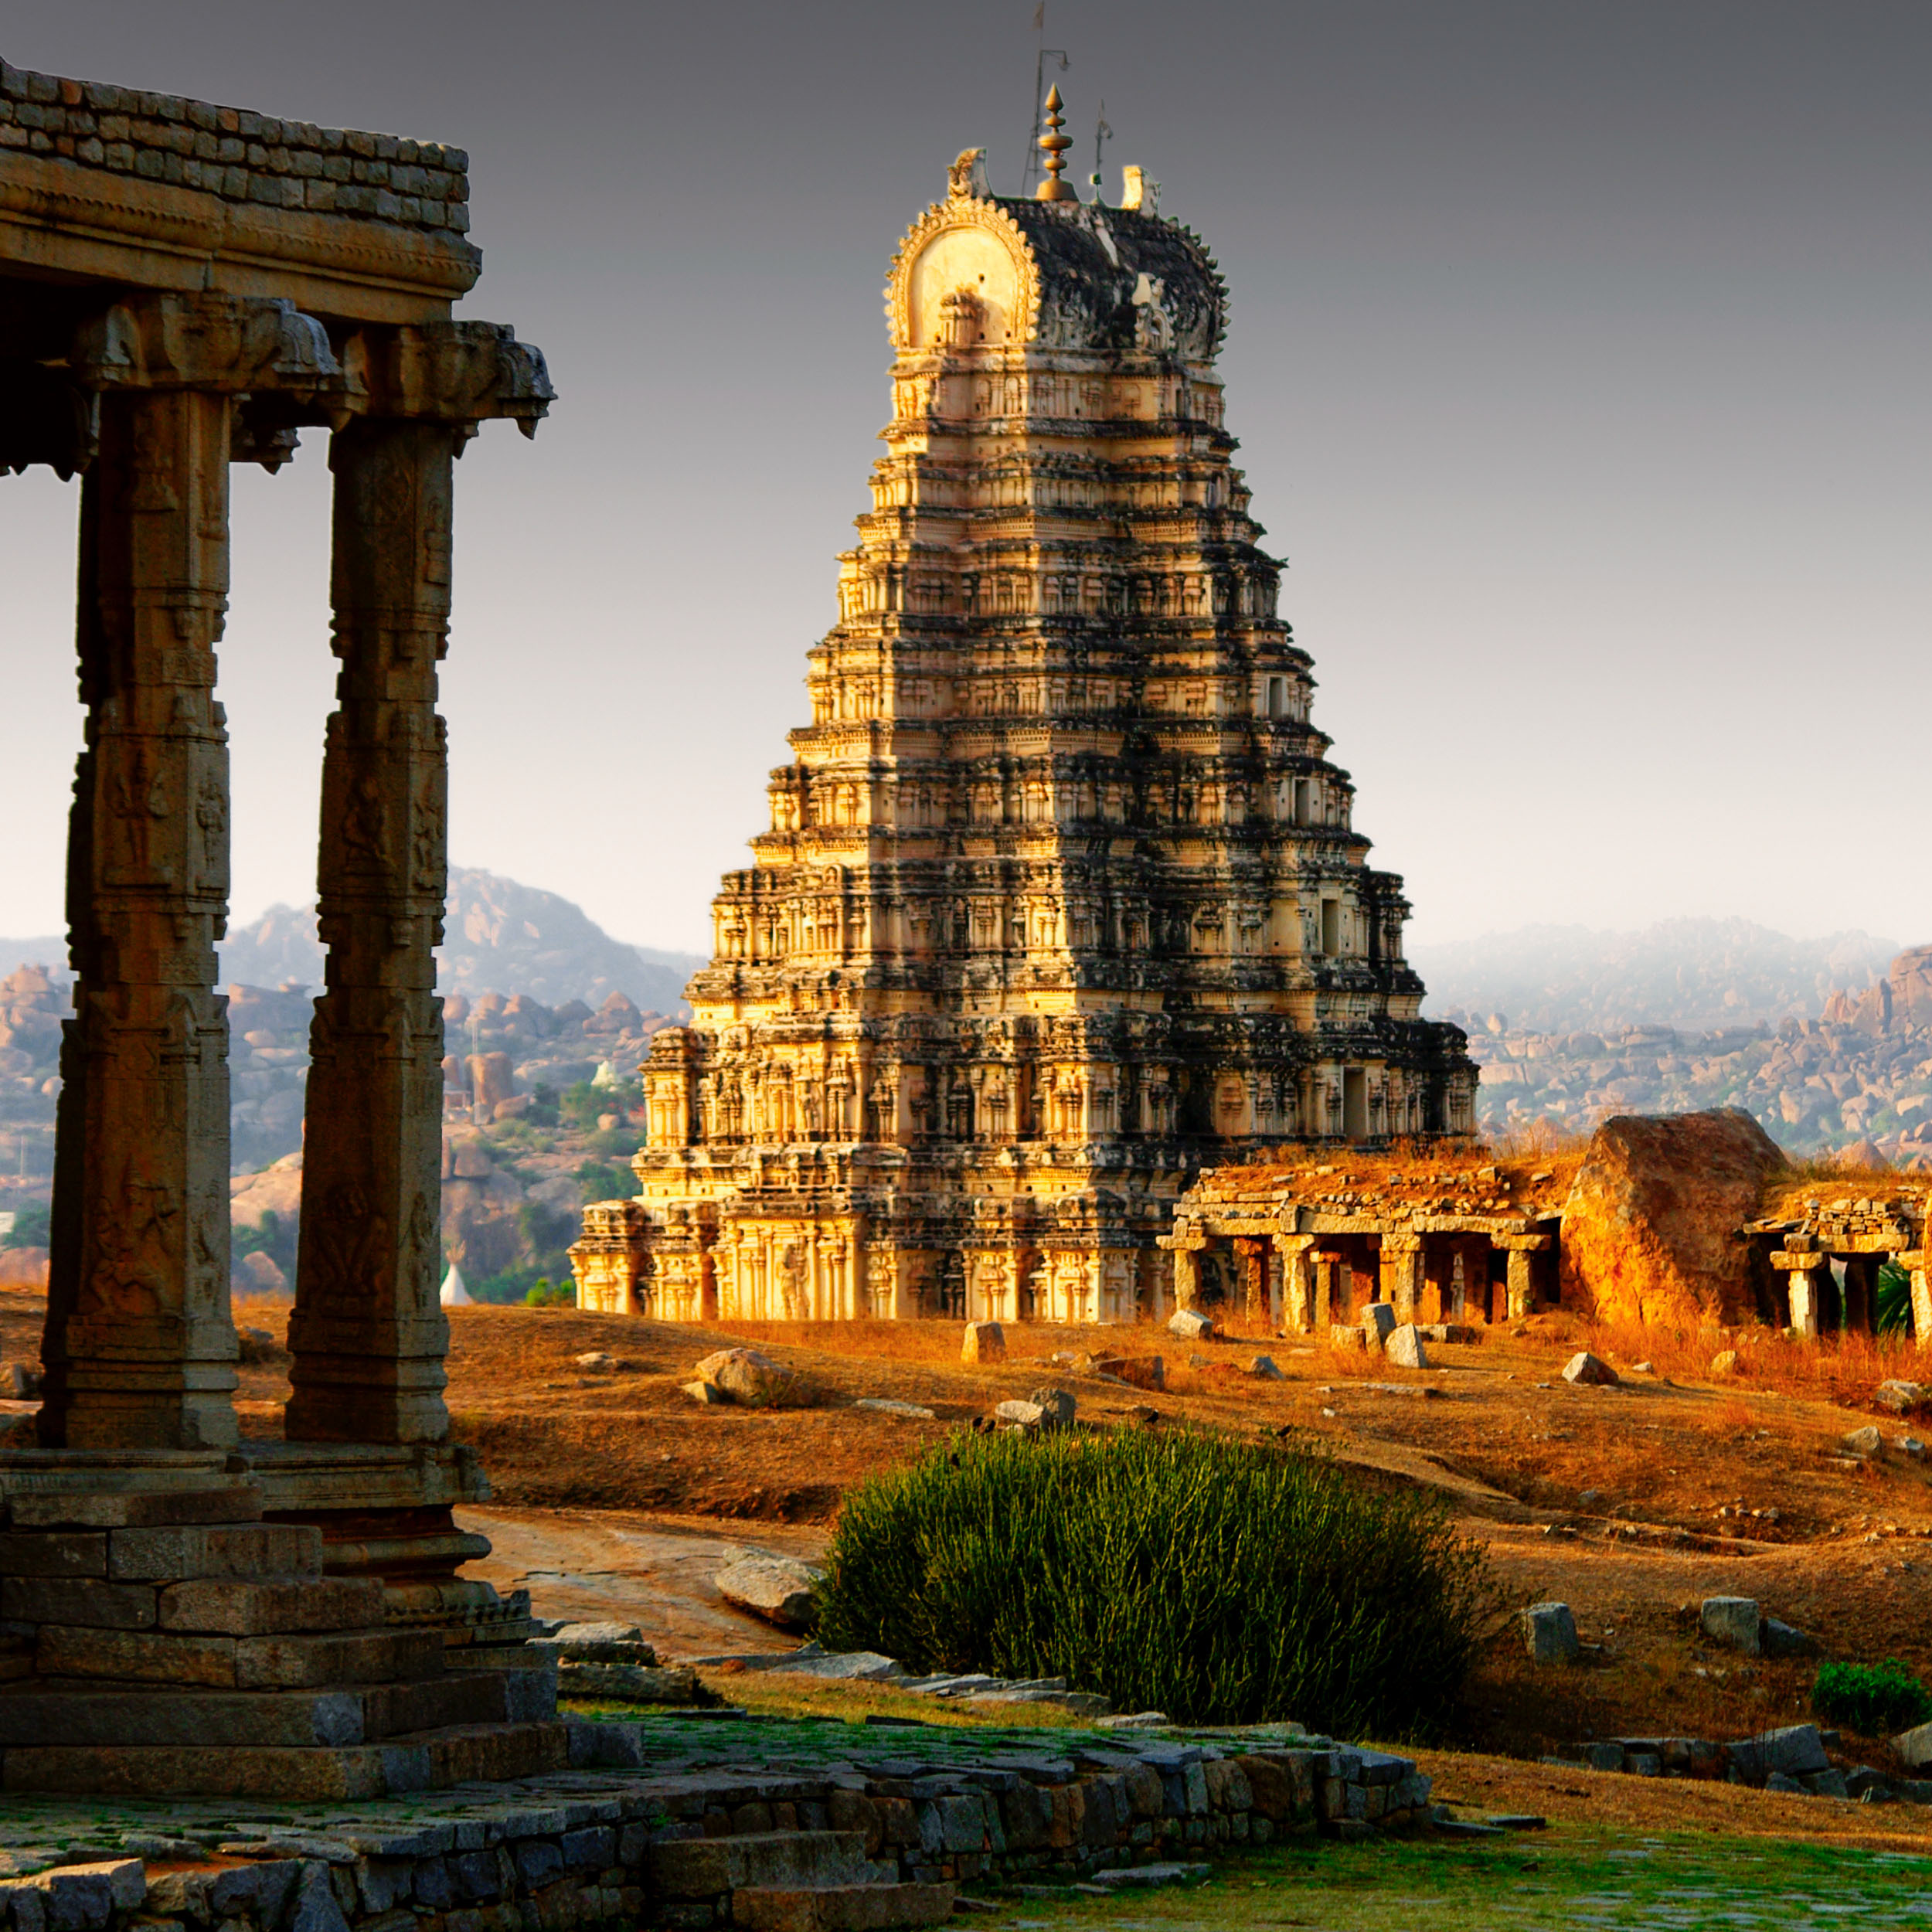 Hindoe architectuur en sculptuur tot 1200